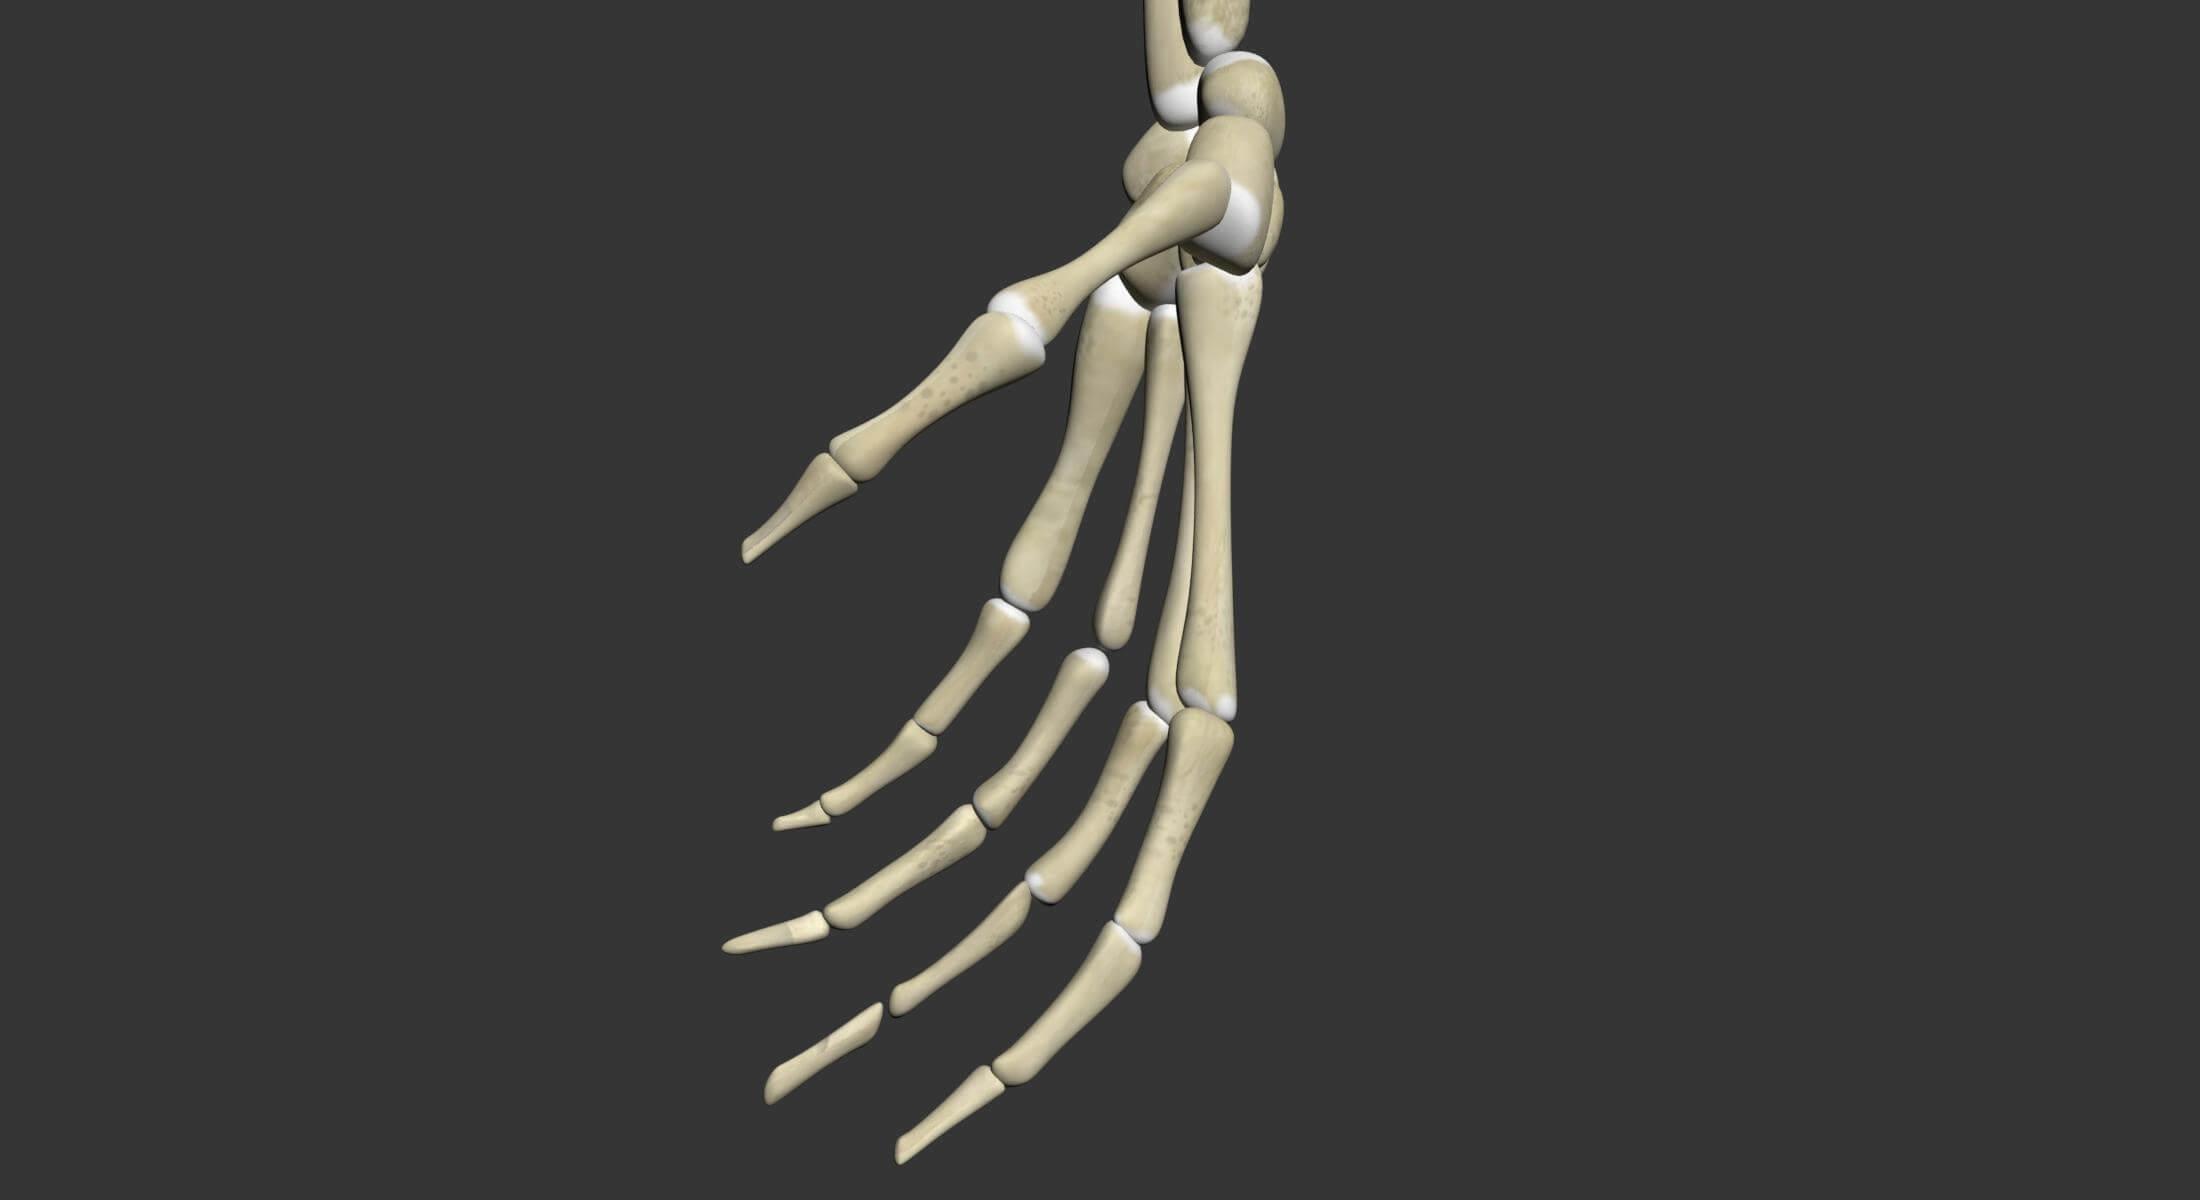 Human Skeleton Arm 3d Model